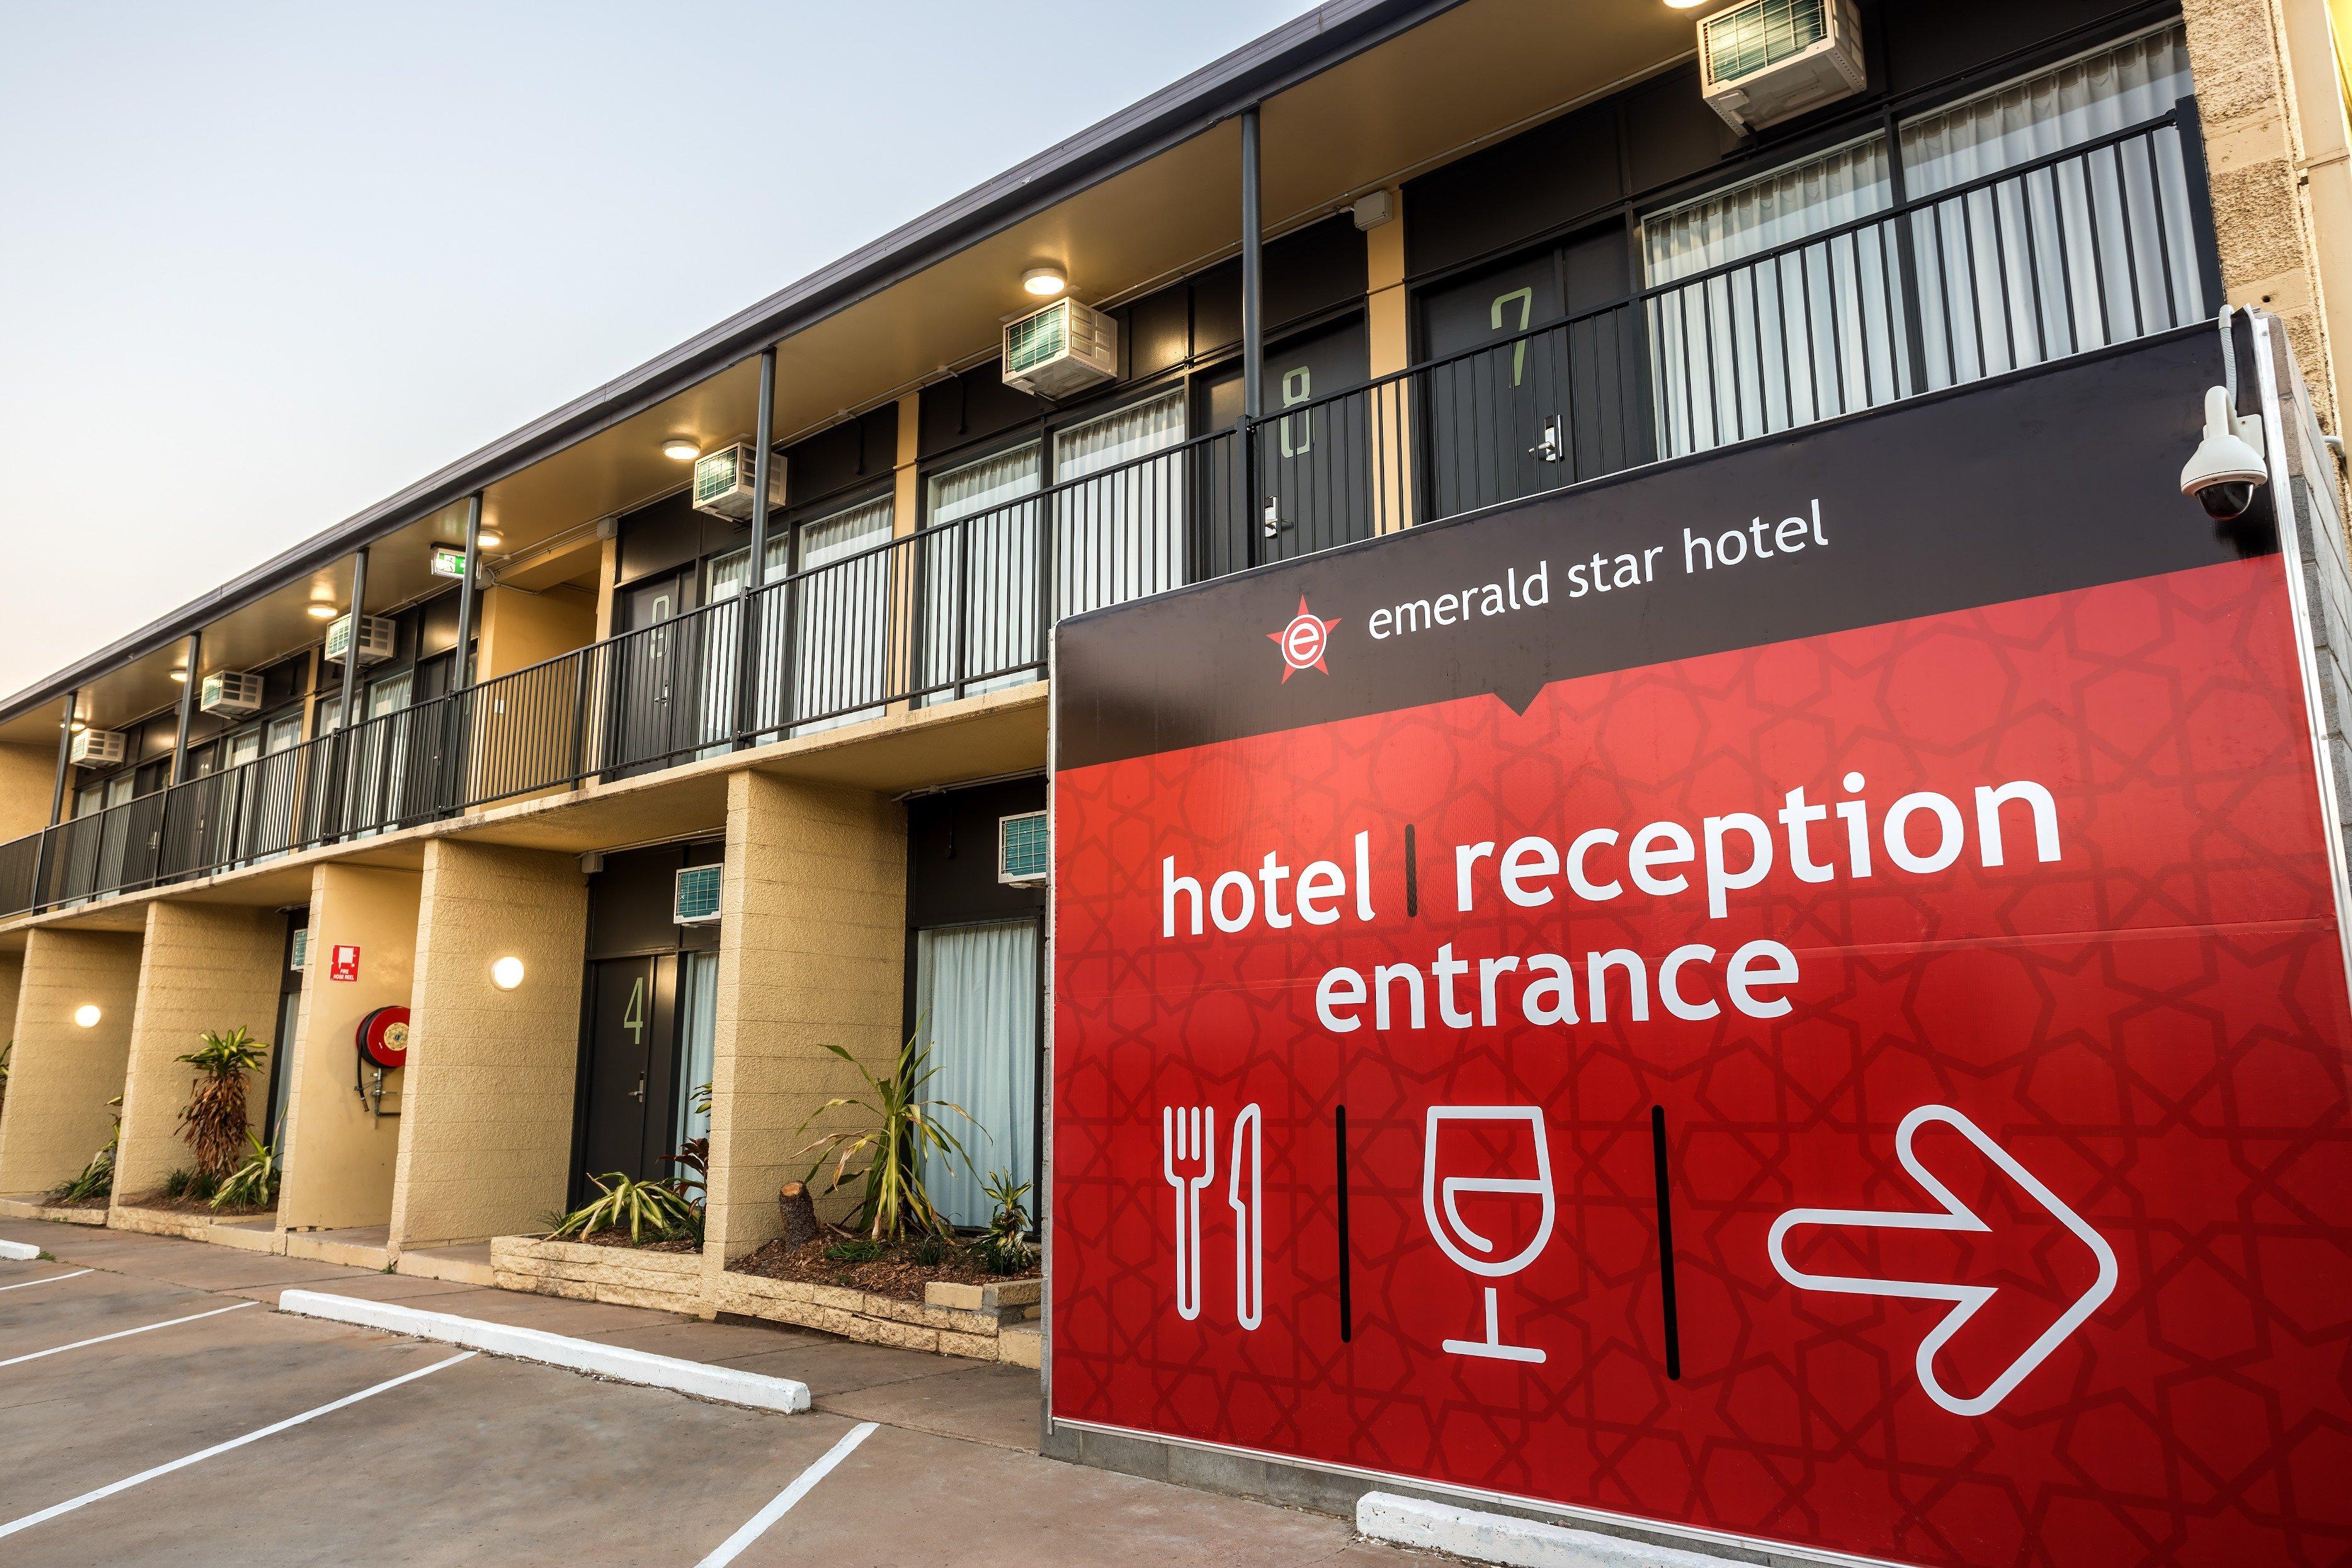 emerald star casino resorts